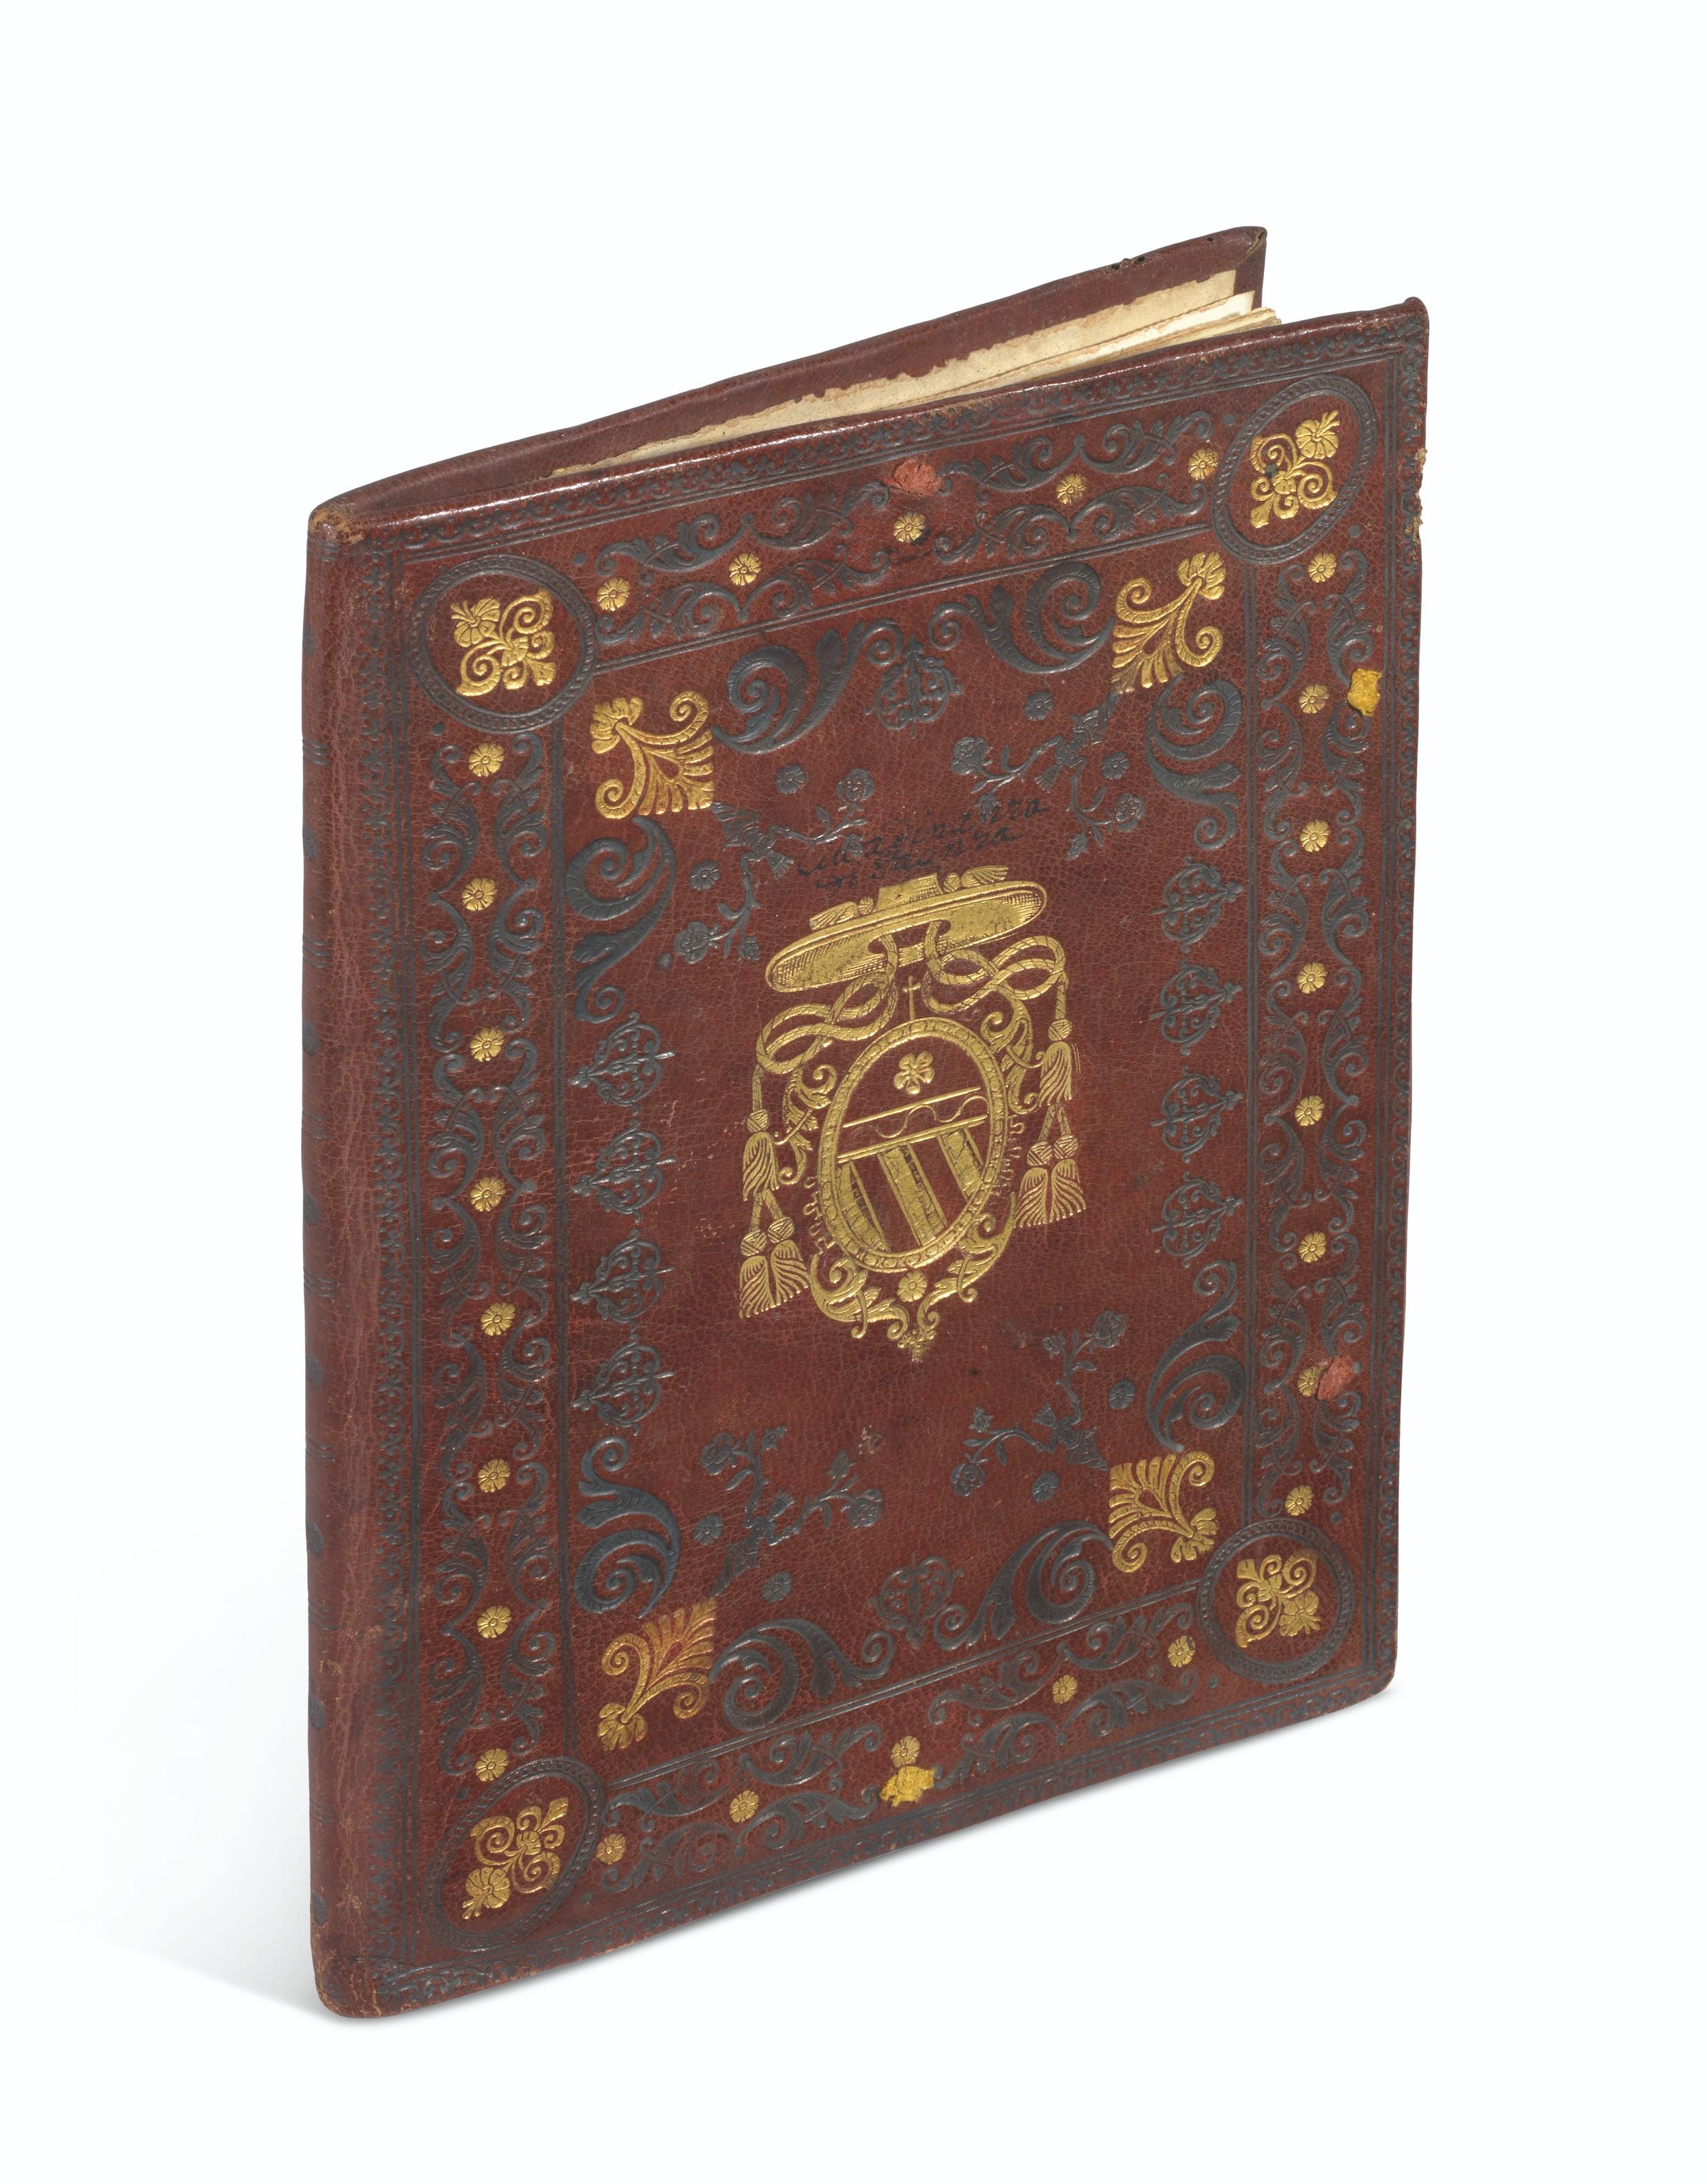 Honorary citizenship of Faenza, granted to Ferdinando, Paolo Giordano, Virginio and Francesco Orsini and their heirs, in Latin, illuminated manuscript on vellum, Faenza, 1621